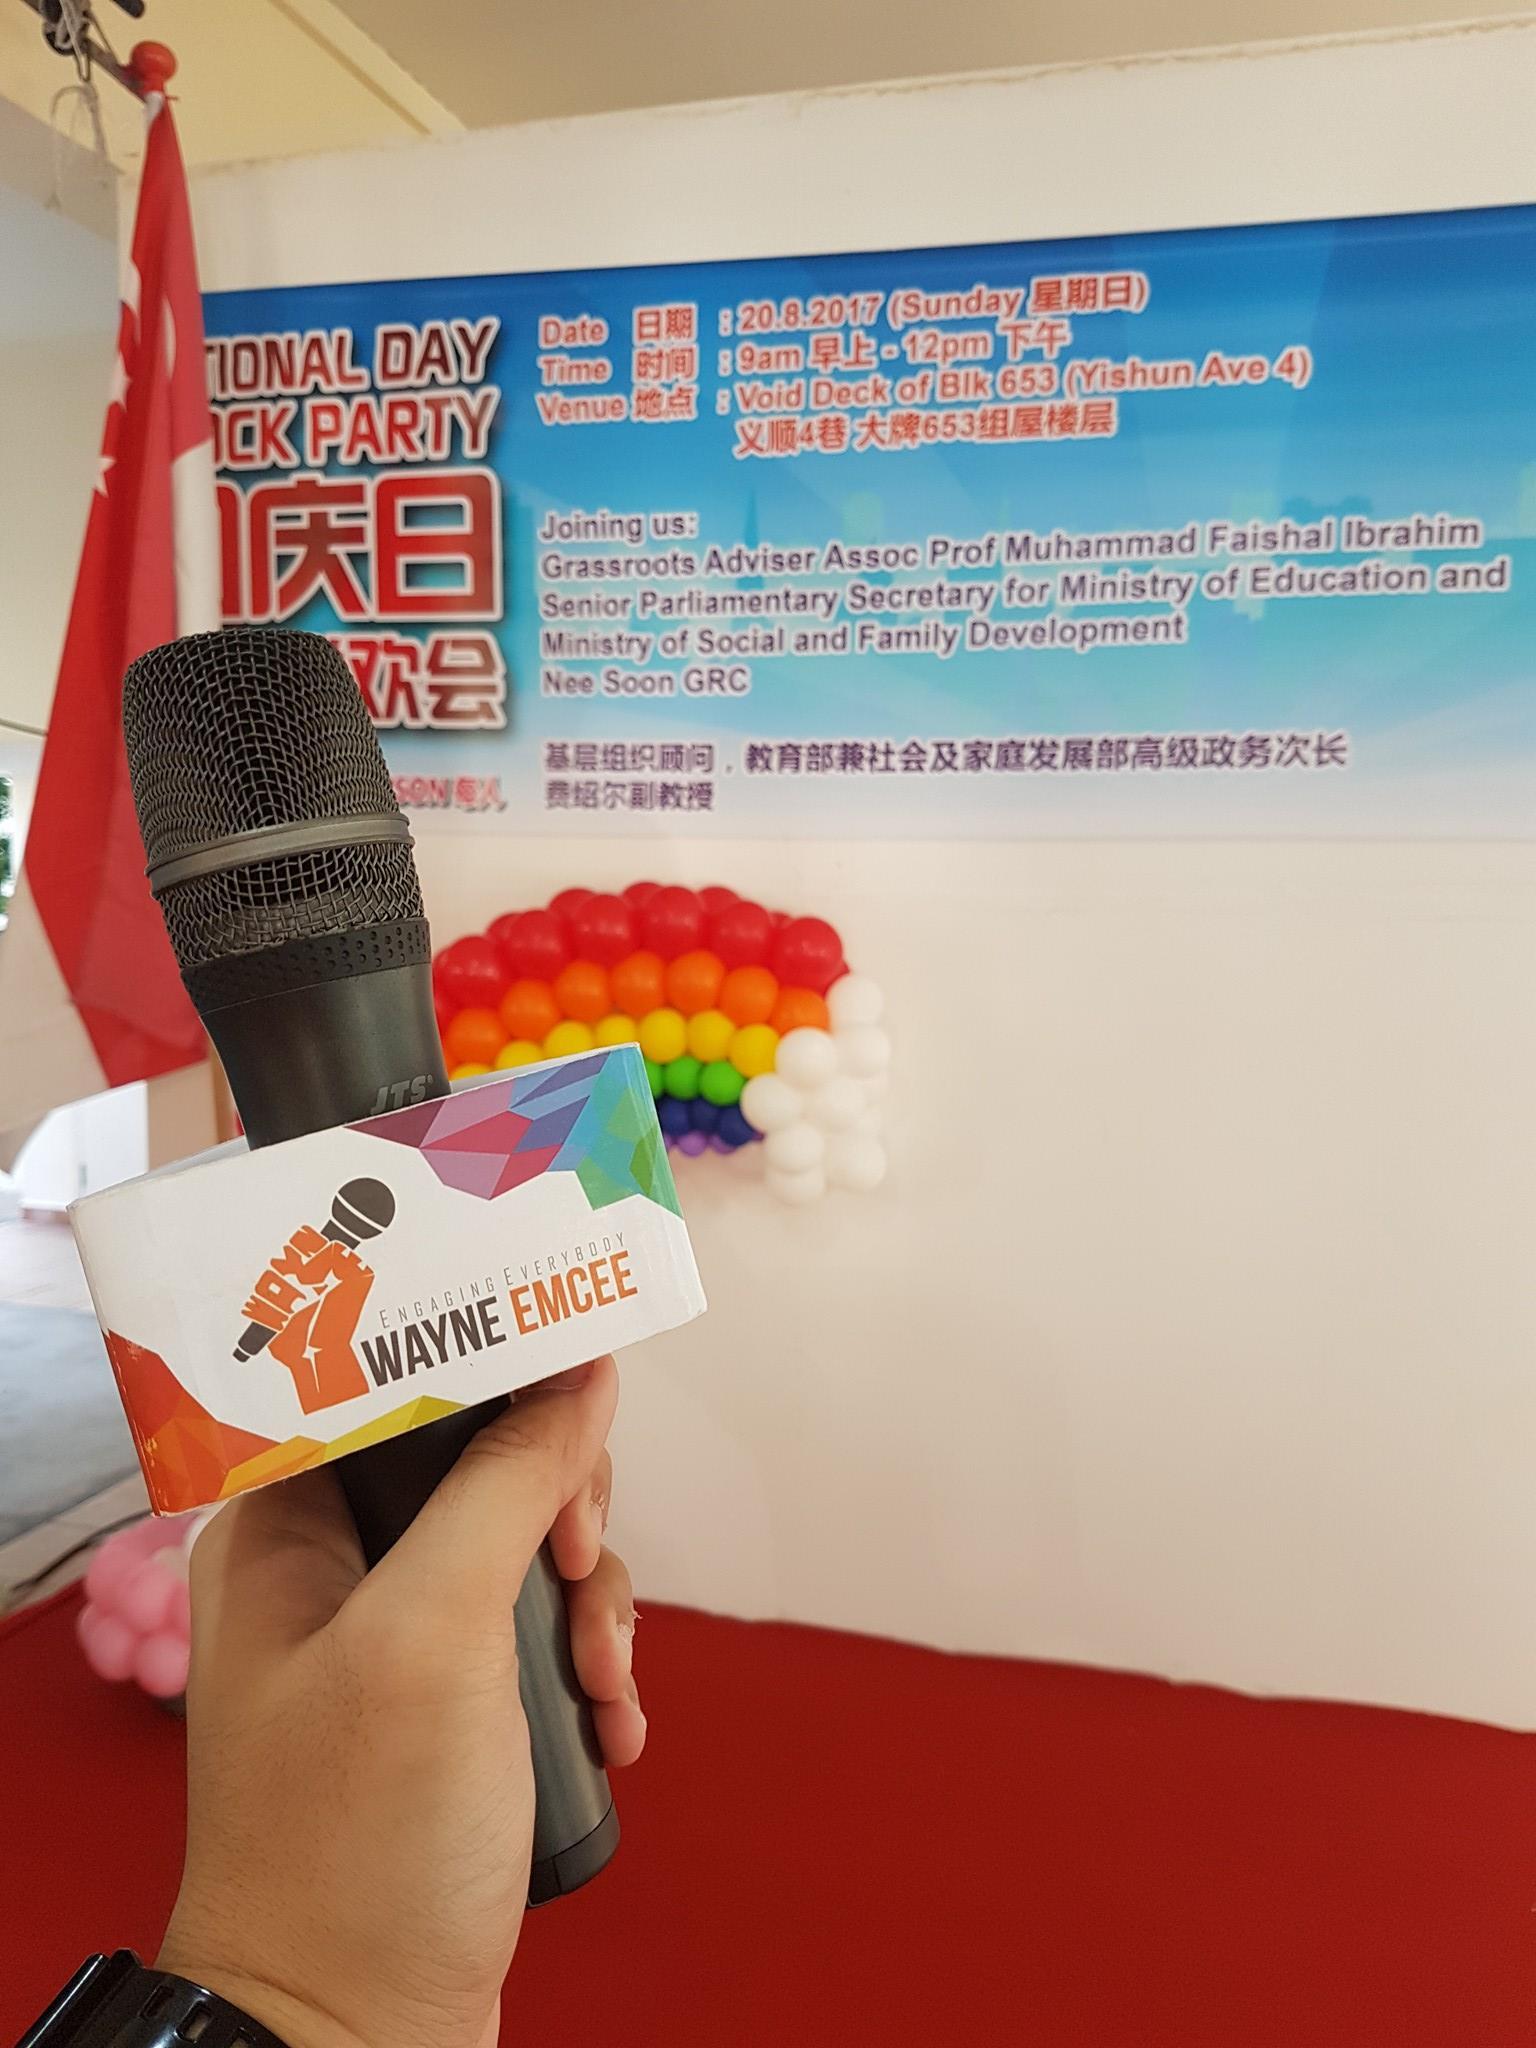 Post National Day Celebration at Yishun